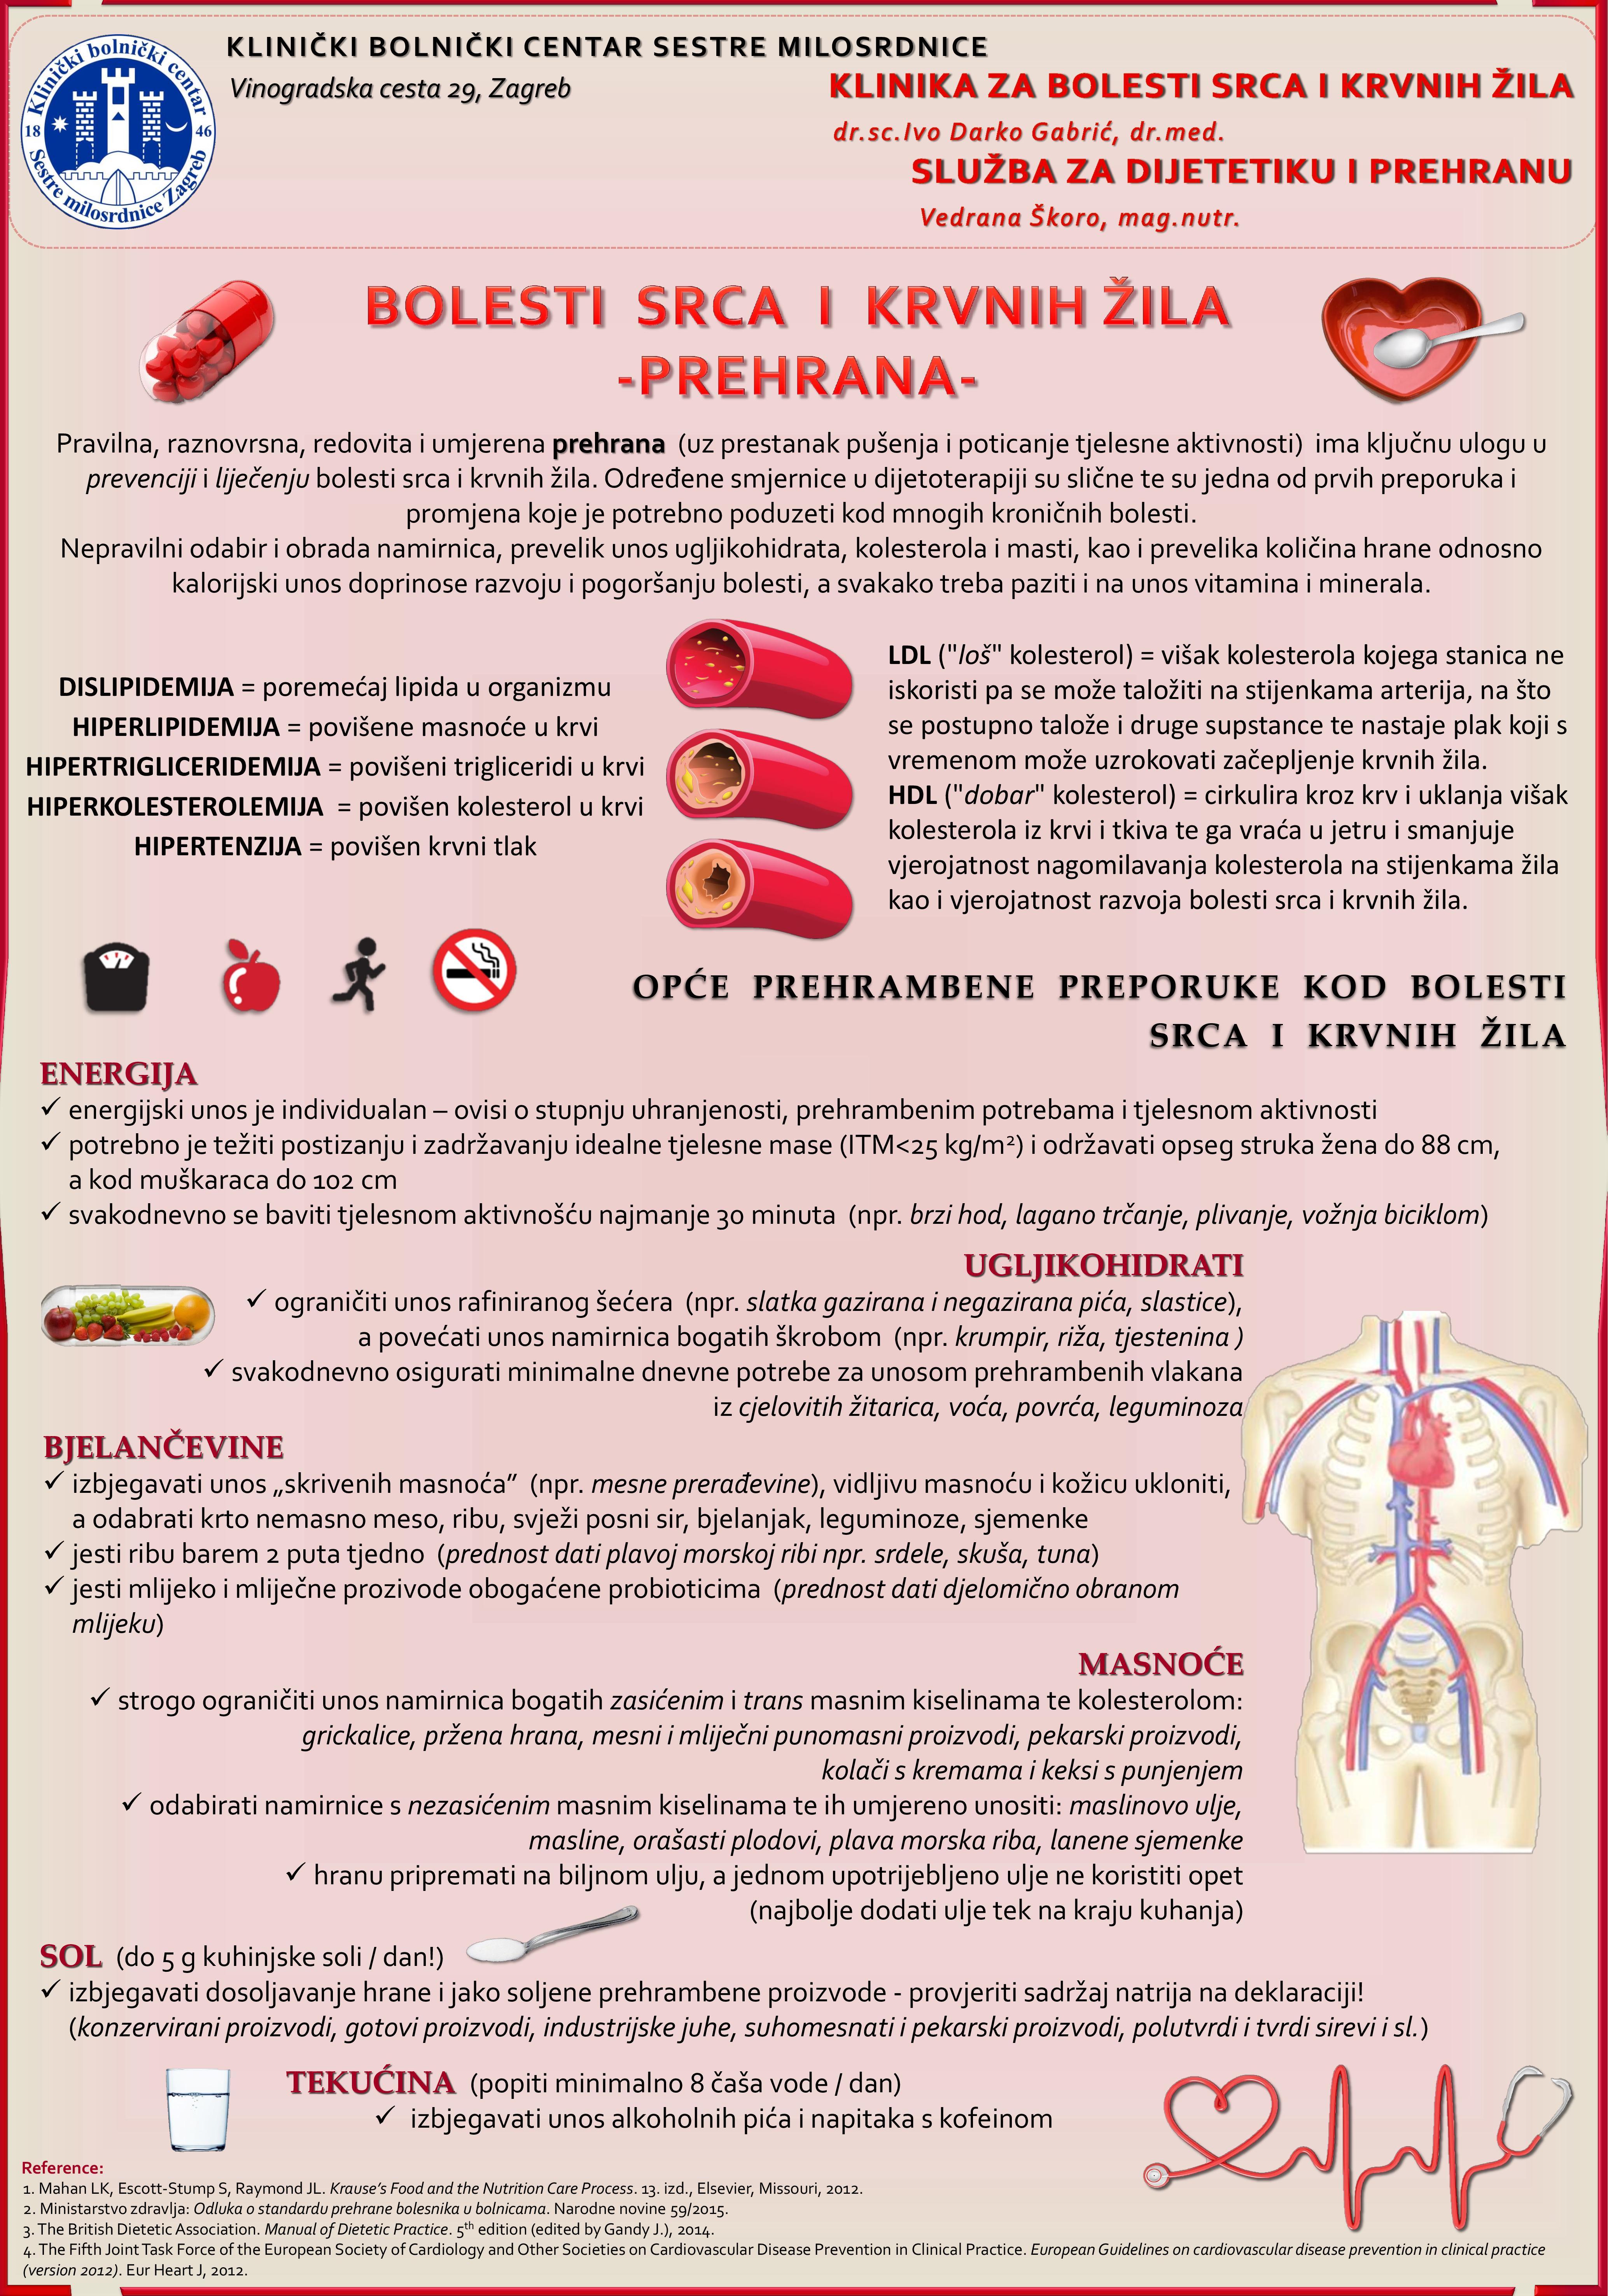 hipertenzija je bolest srca i krvnih žila